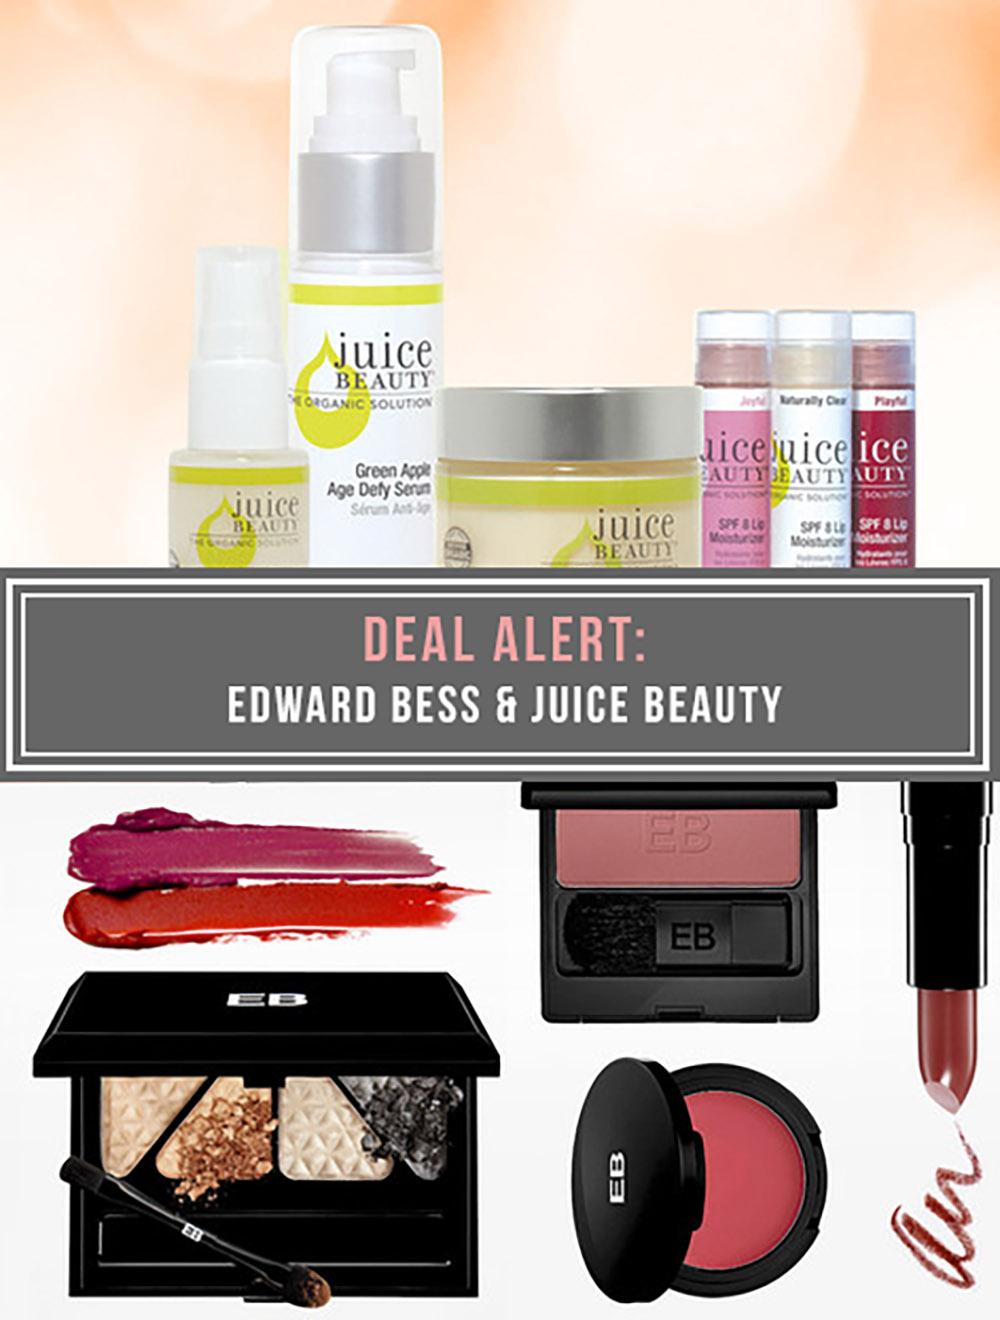 DEAL ALERT: Edward Bess and Juice Beauty